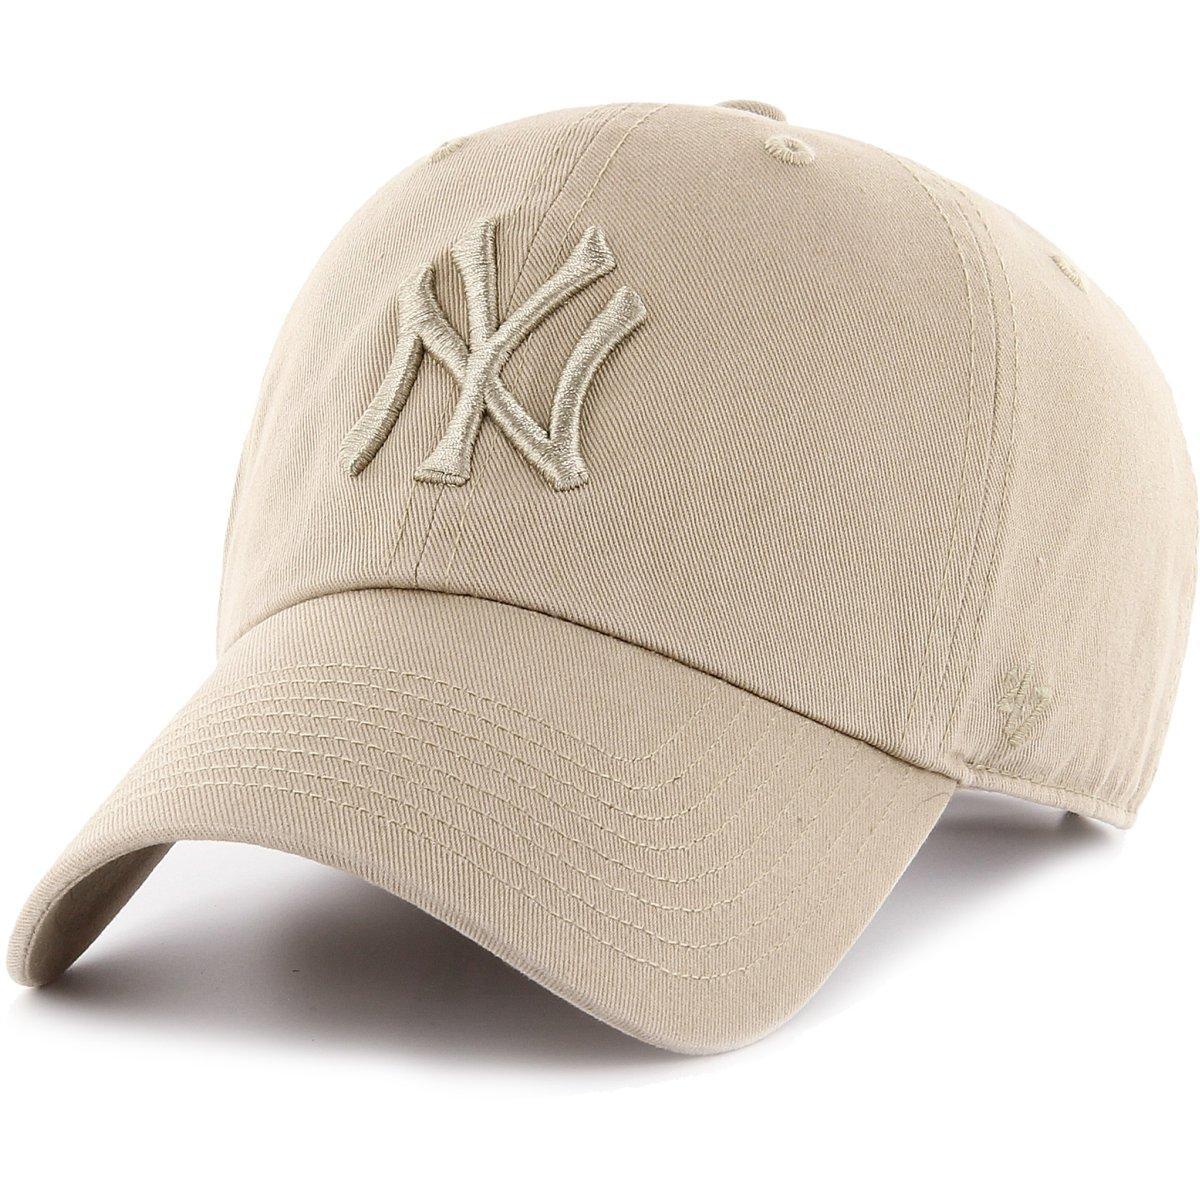 reputable site d2d68 8081d Details about 47 Brand Adjustable Cap - CLEAN UP New York Yankees khaki